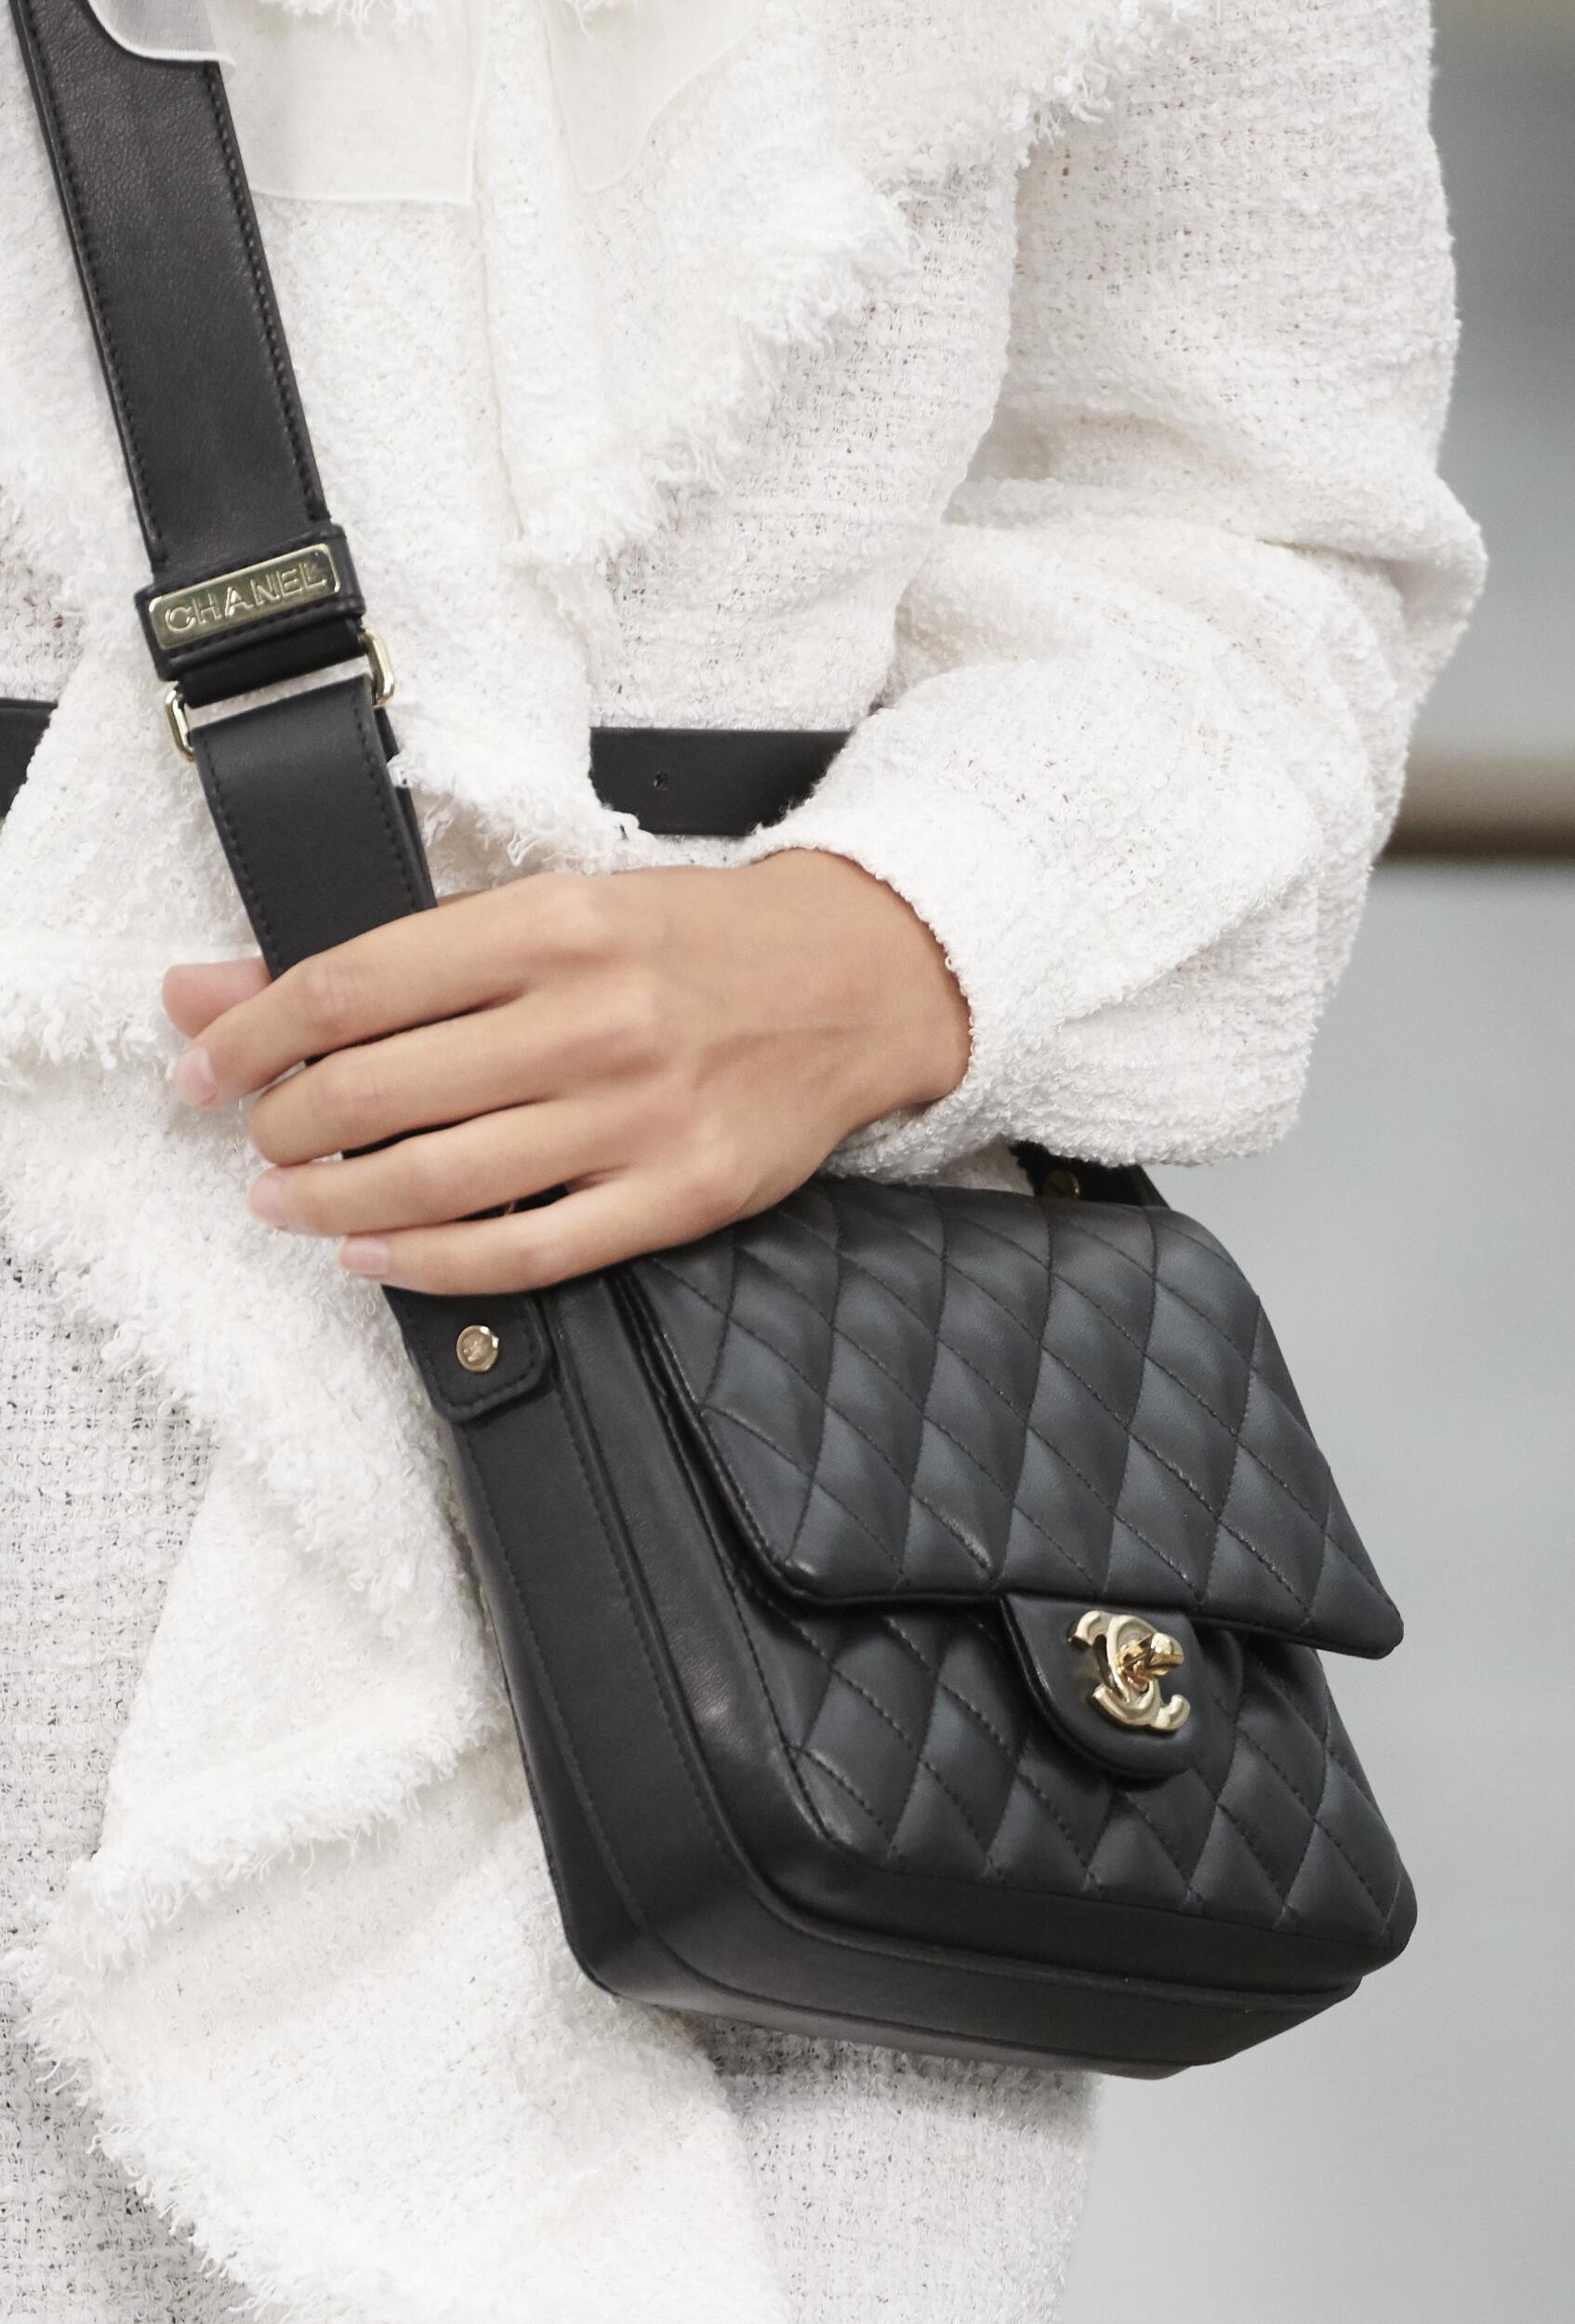 2020 Bag Chanel Summer